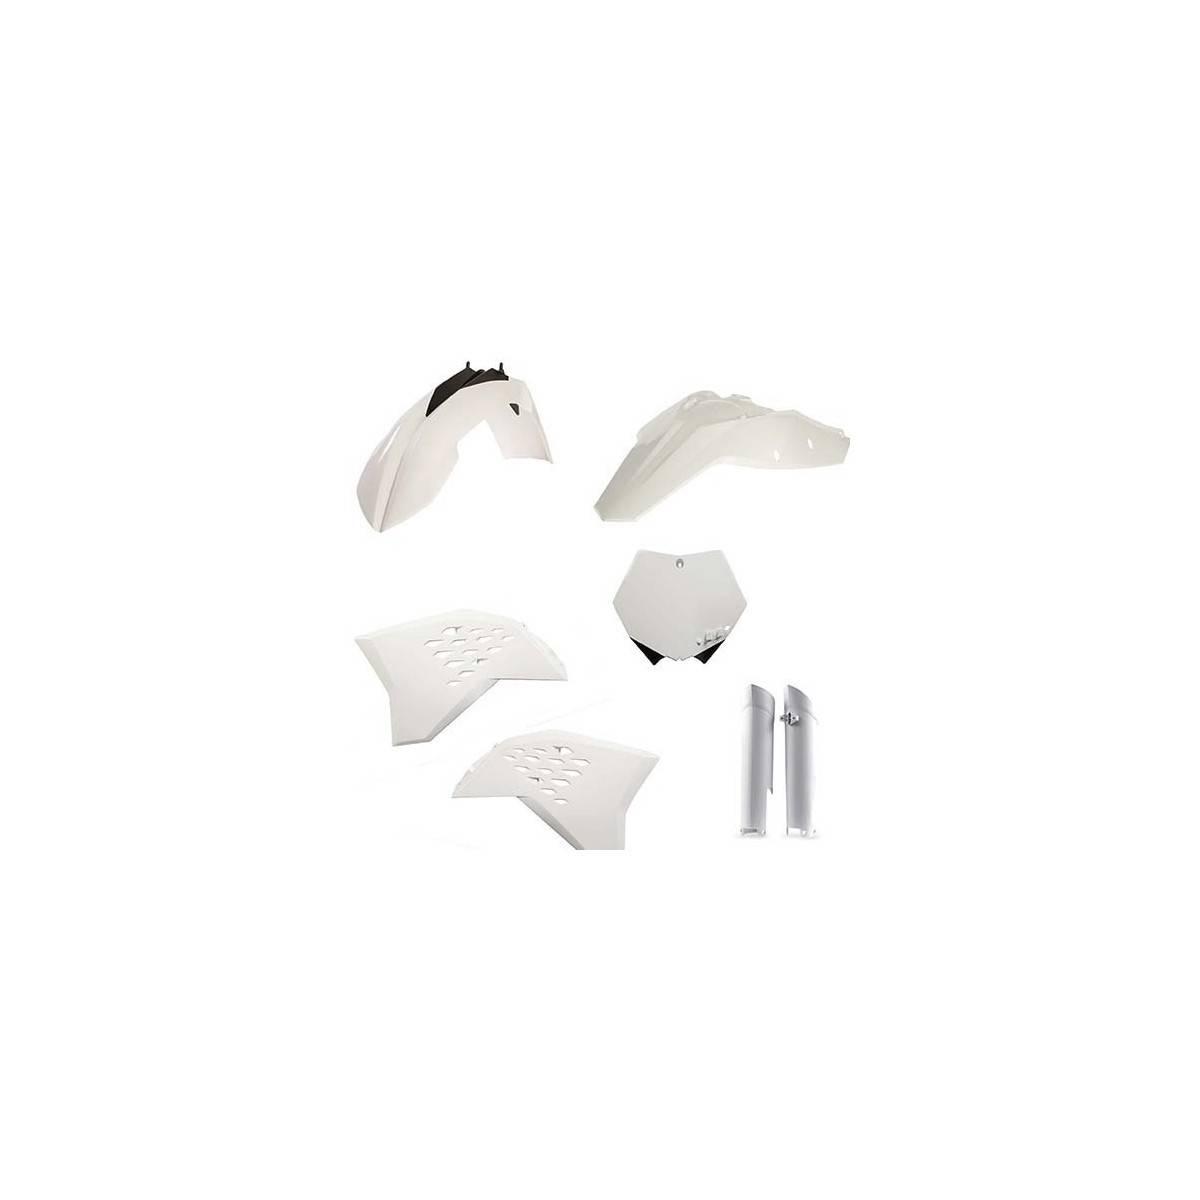 0022808-030 - Full Kit Plasticos Tc85 14 17 Blanco